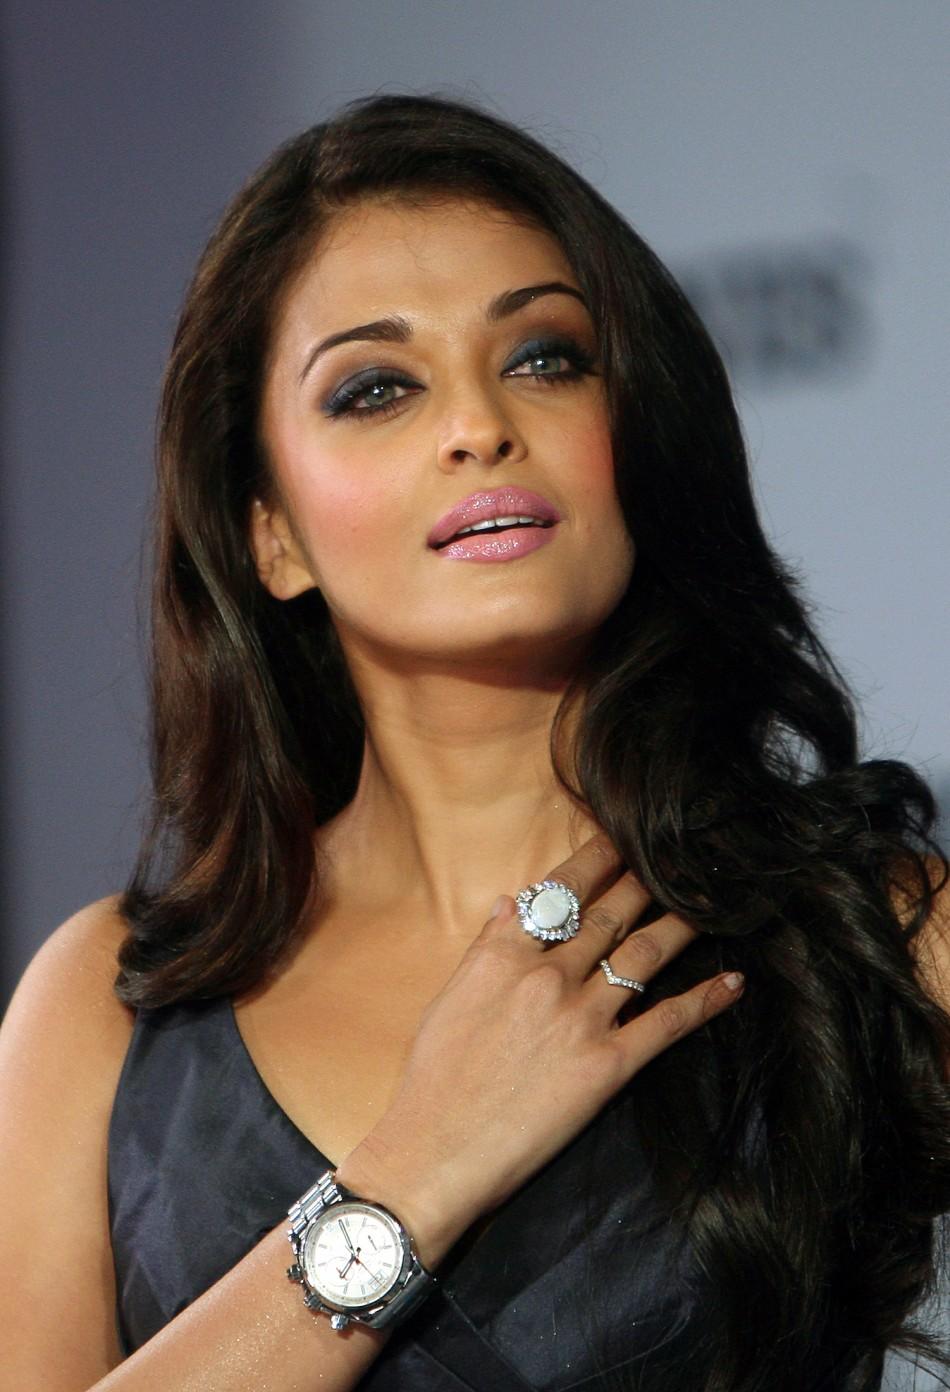 Aishwarya Rai Bachchan is the brand ambassador of Longines